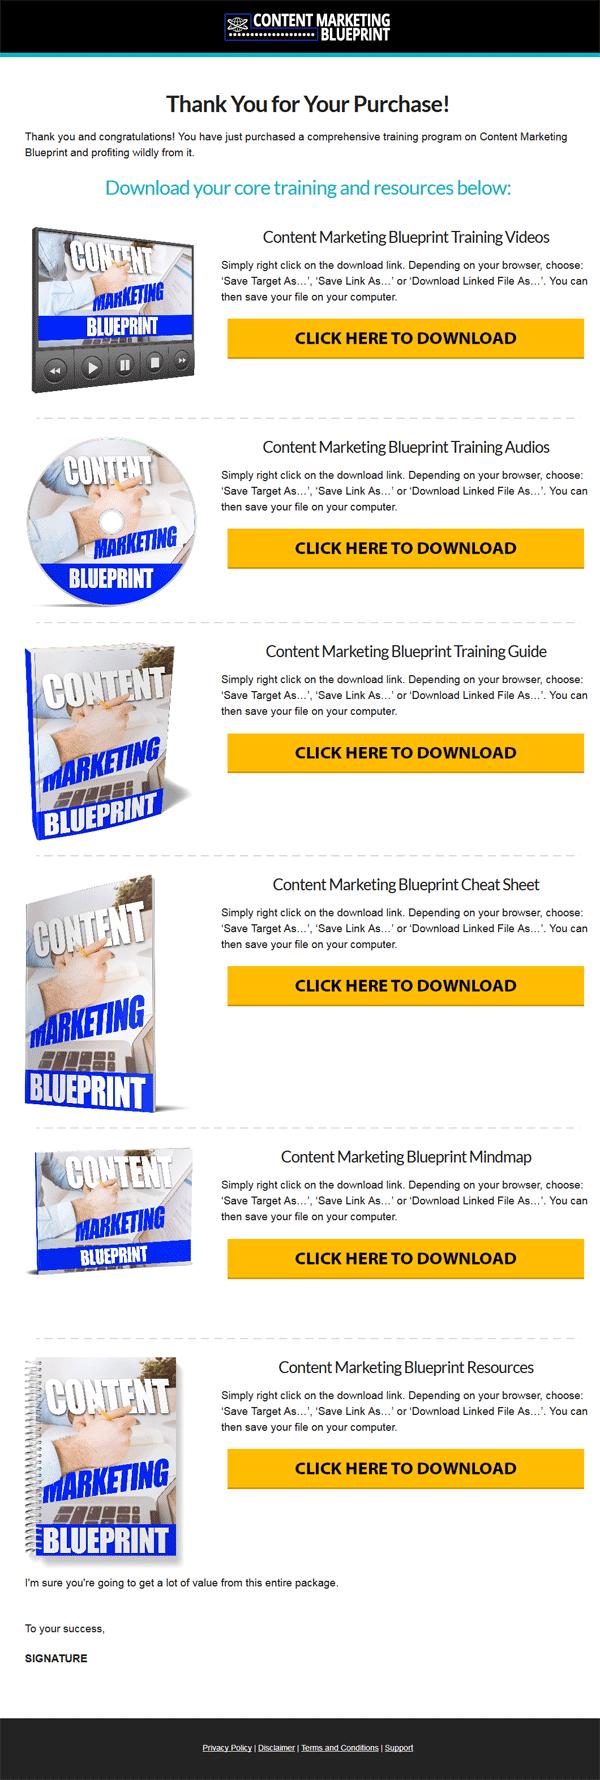 Content Marketing Blueprint Ebook and Videos MRR